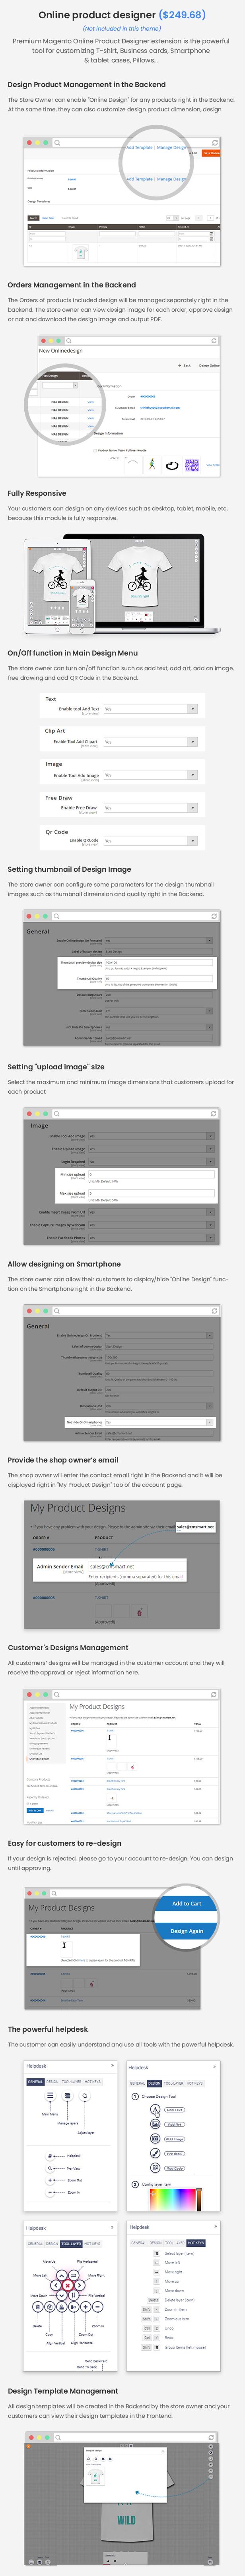 Printshop - Responsive Magento Printing Theme - 16